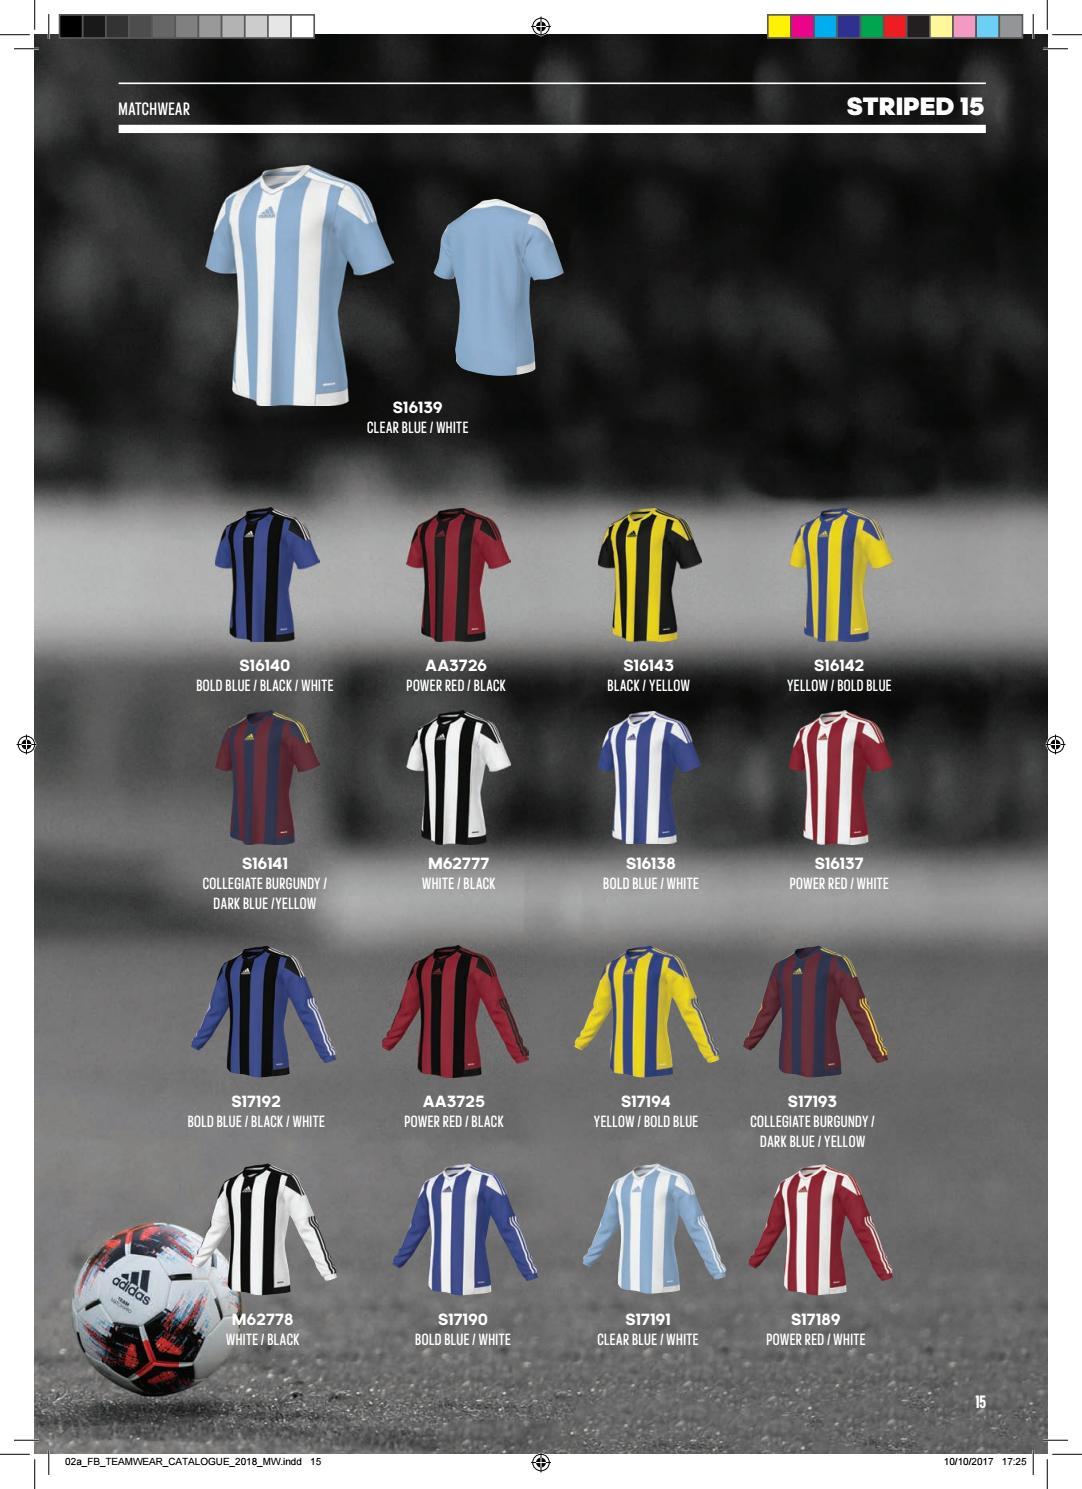 arrastrar Etna caligrafía  Adidas Teamsport-Katalog 2018 by Teamplayer - issuu